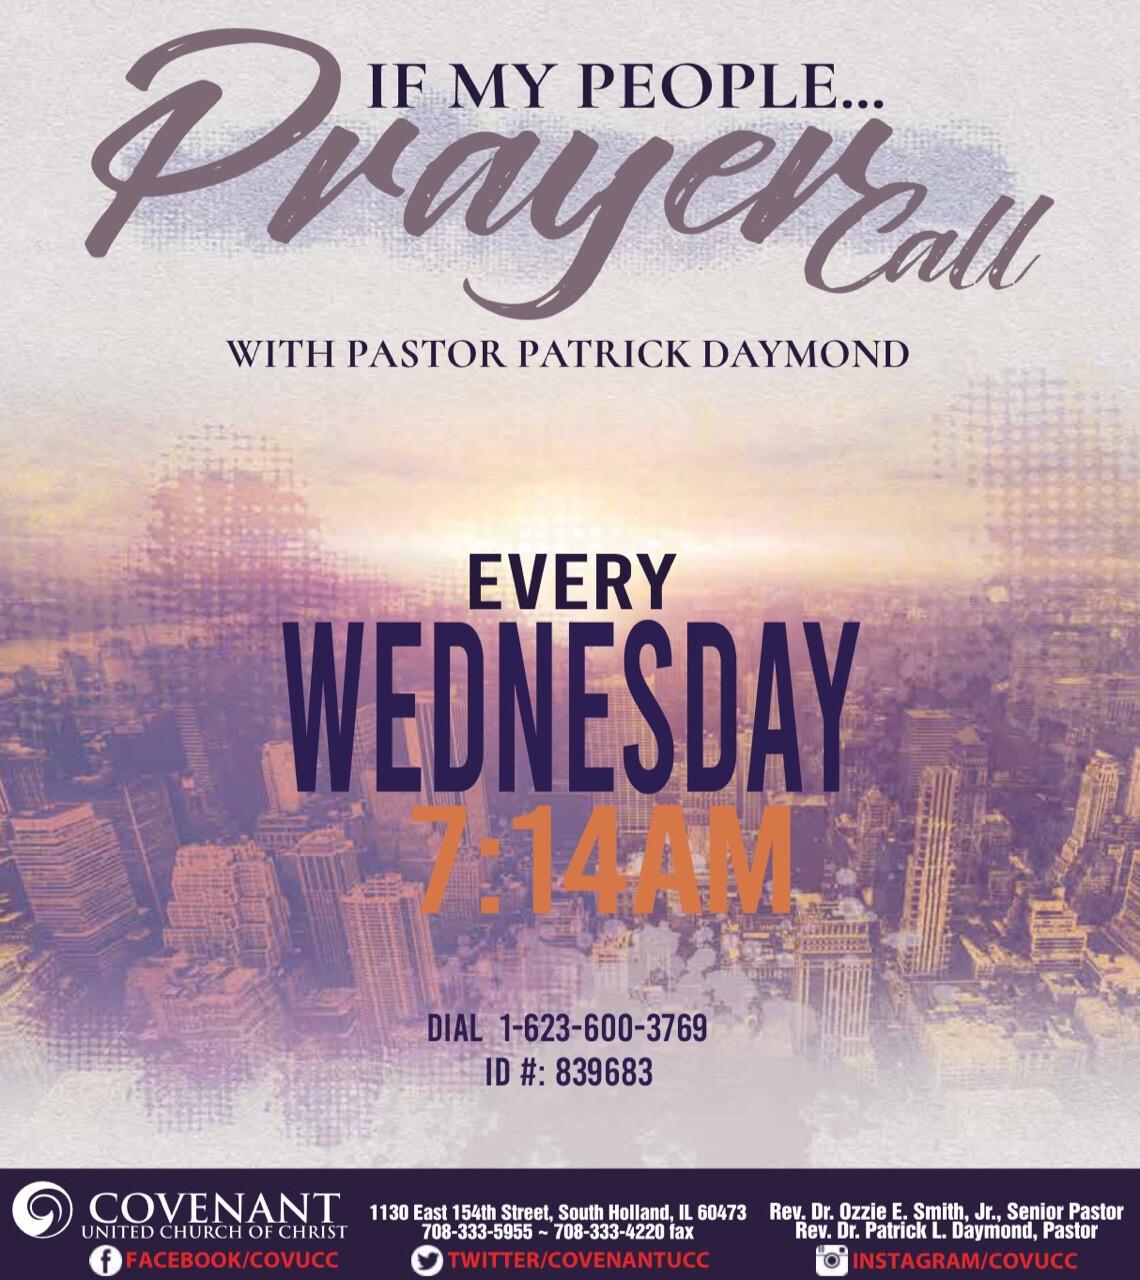 Prayer Call Wednesdays